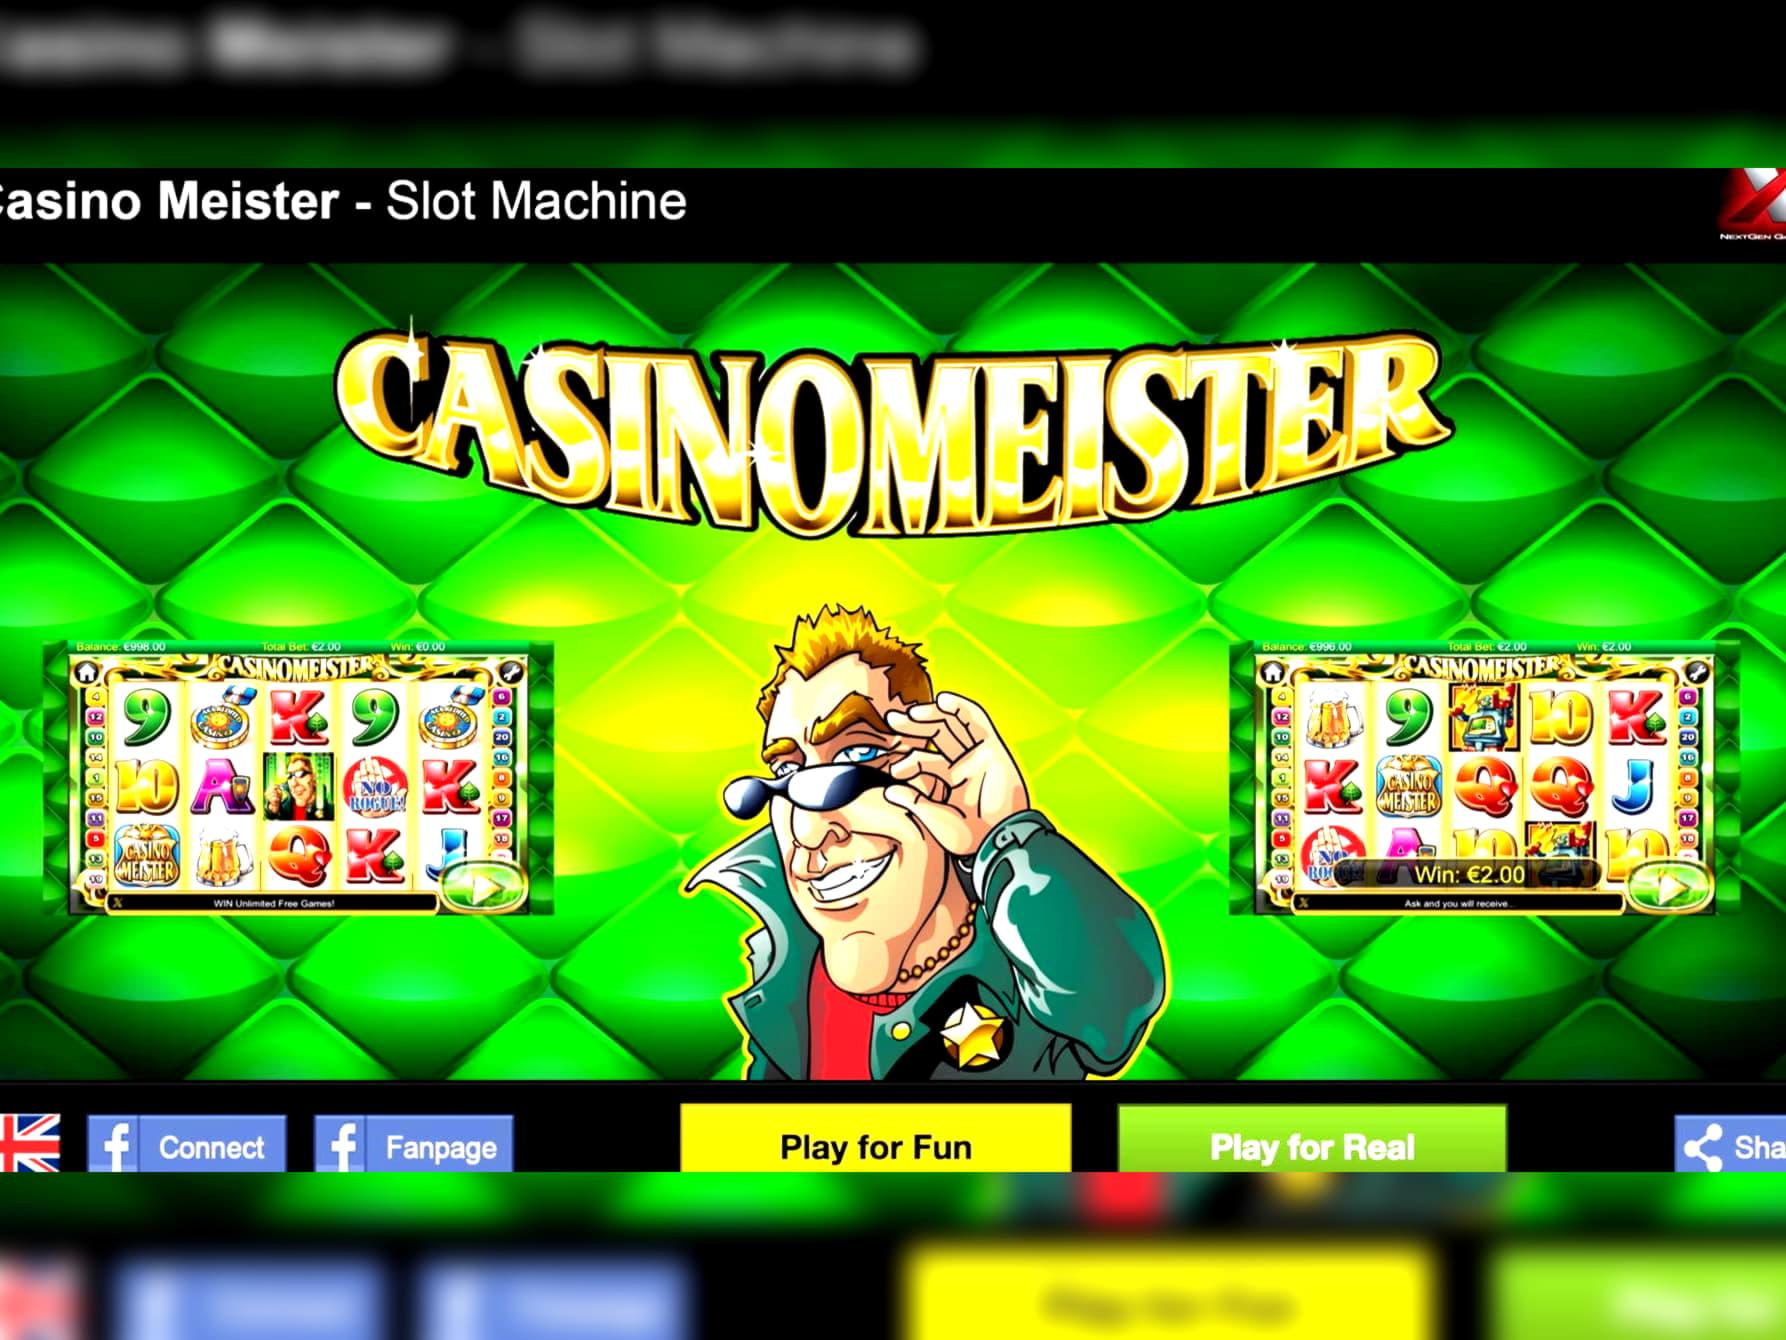 44 free casino spins at bWin Casino